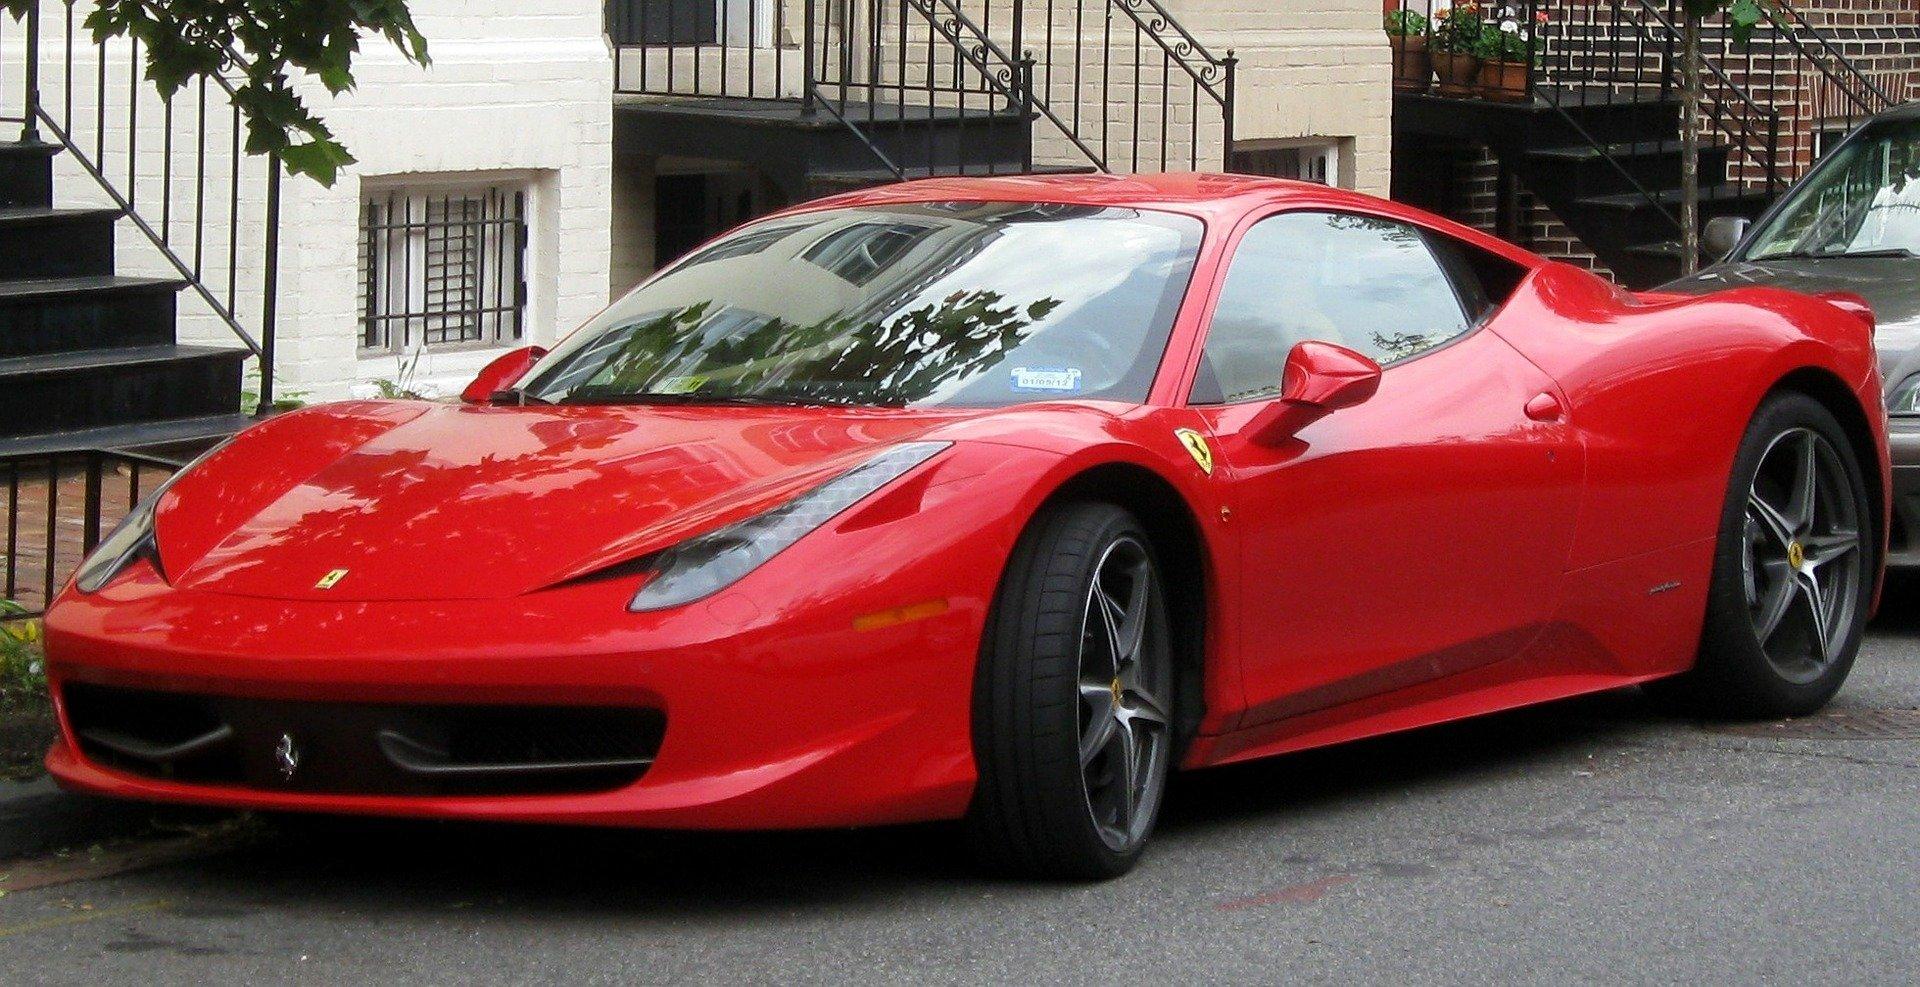 Famously dangerous red Ferrari 458 Italia parked on the street